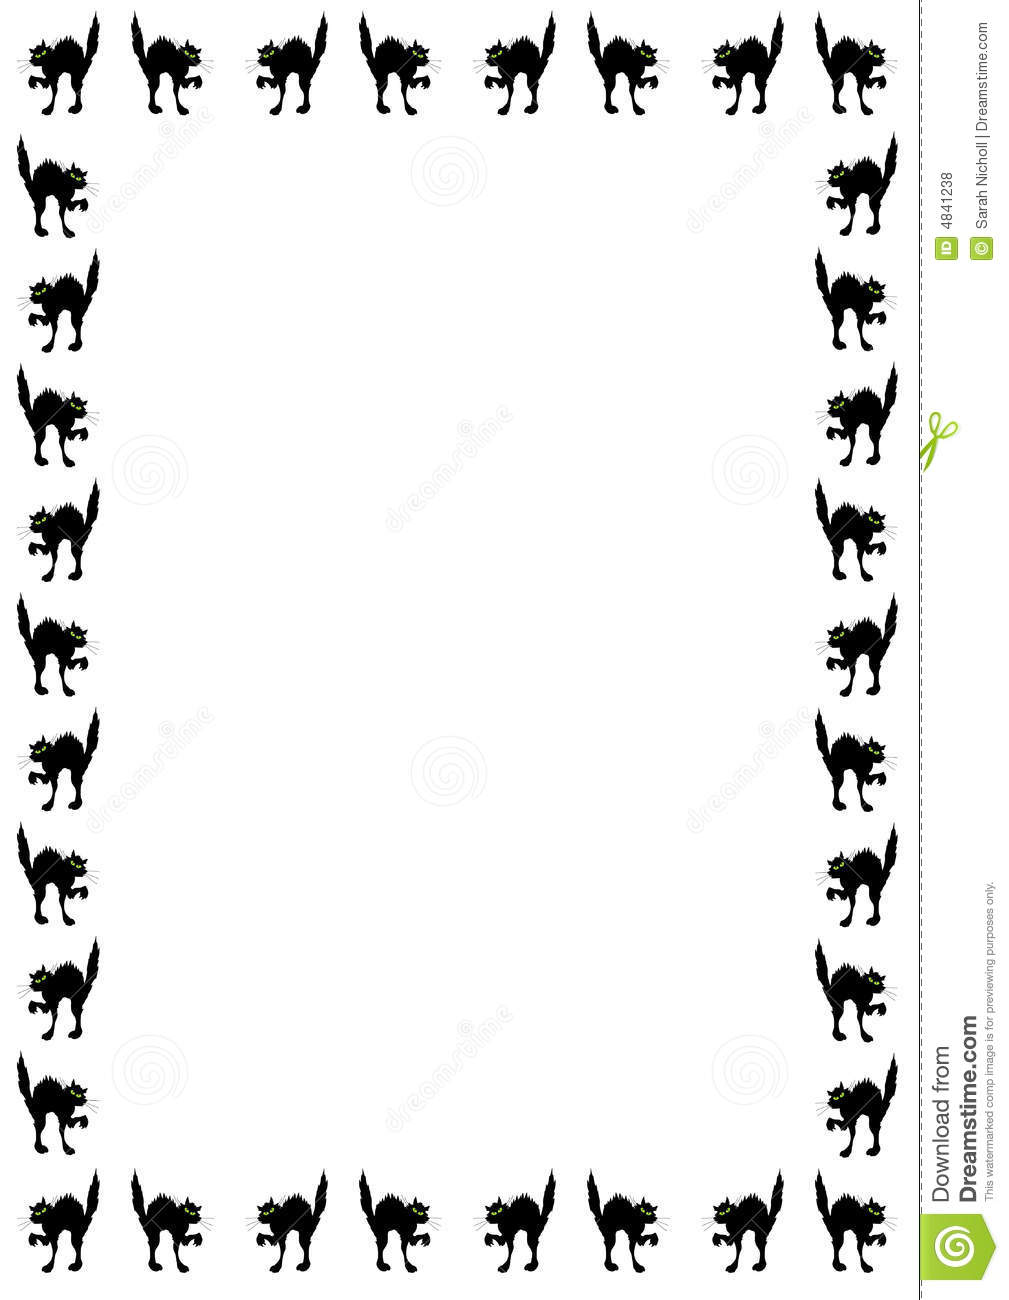 how to print pdf without white border